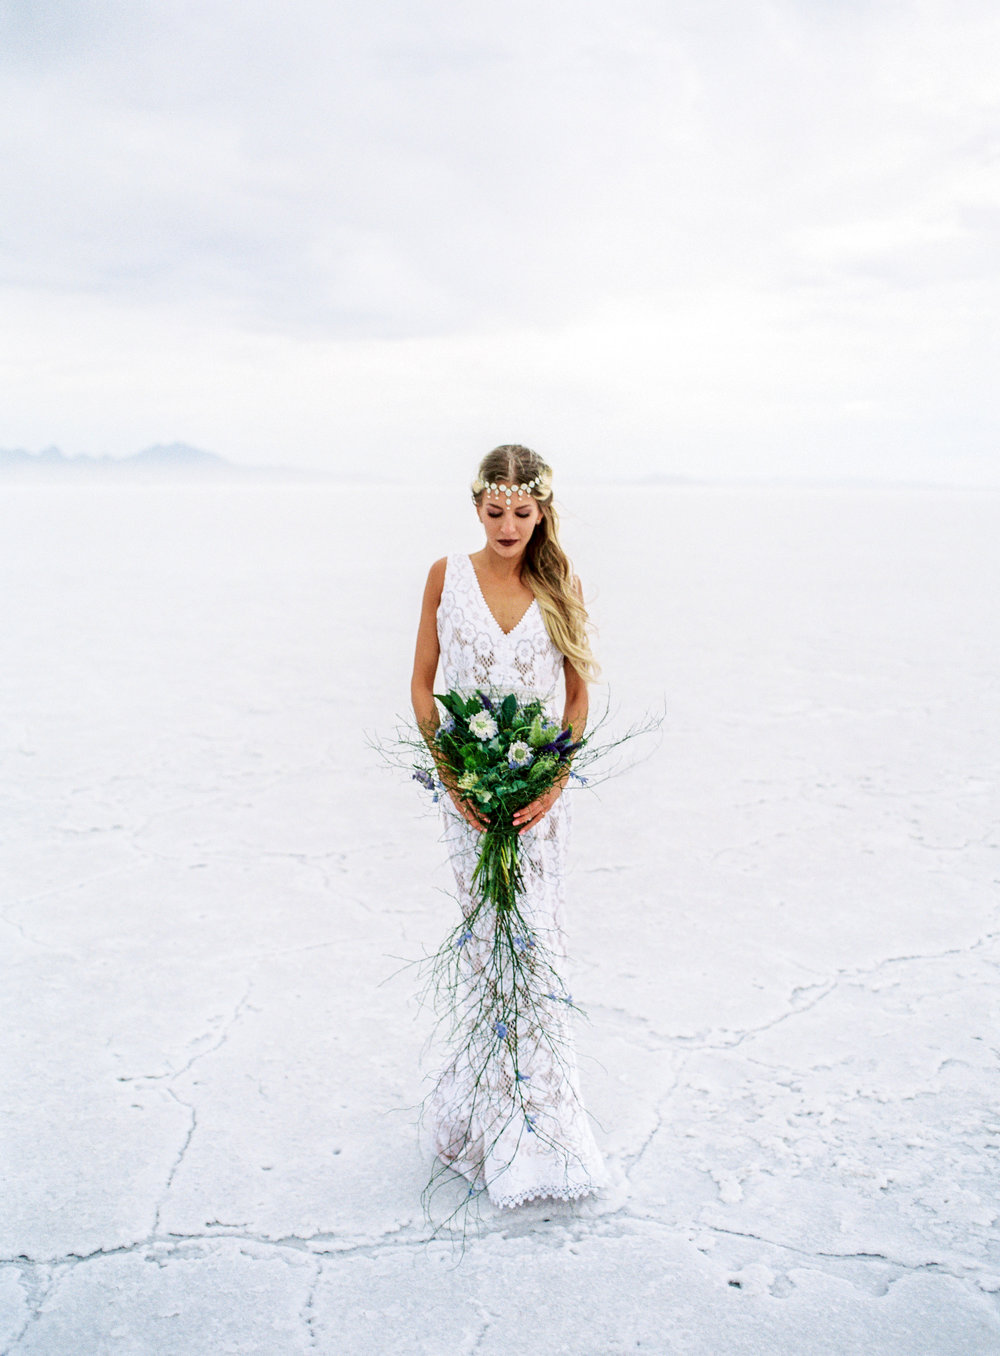 Fuji 400h fine art film wedding photographers l floral studio saldana vintage danani handmade